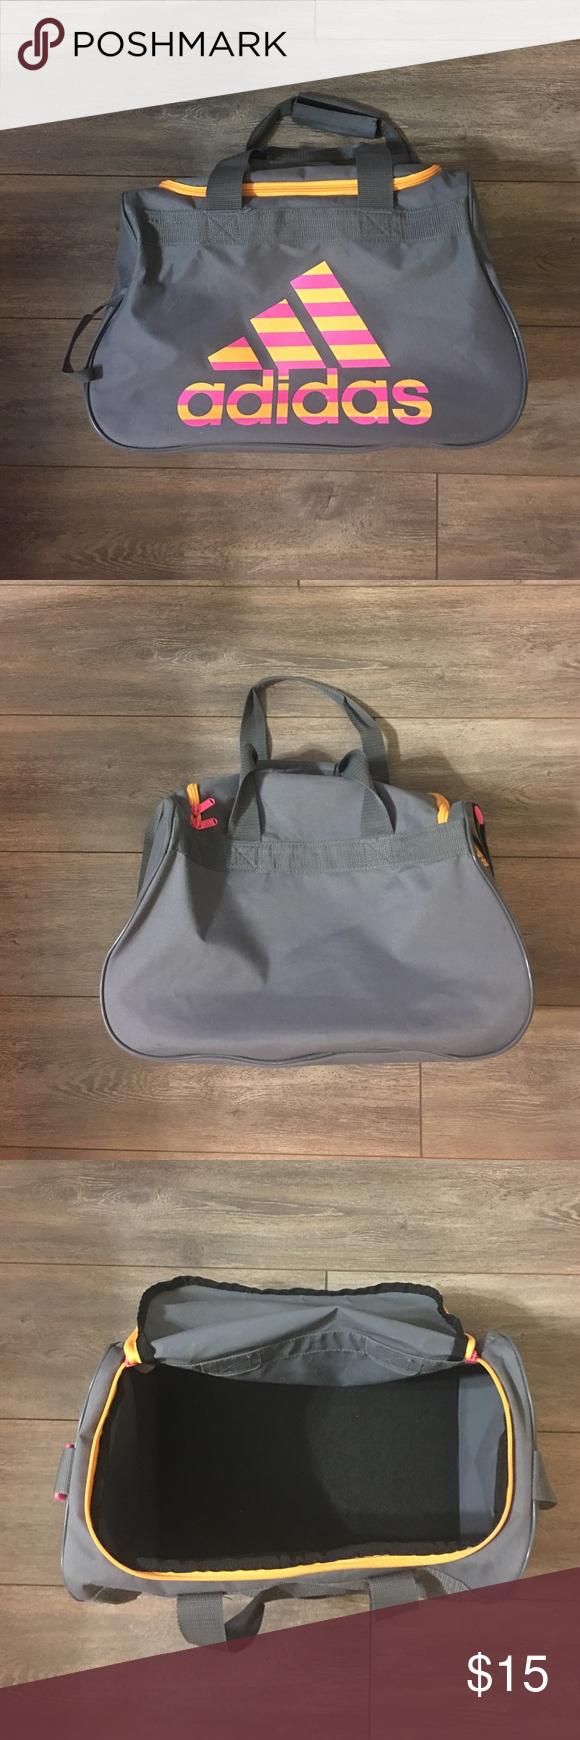 Ladies Adidas gym bag Pink and orange adidas gym bag with gray body. Not a huge  bag d633e5f37277d